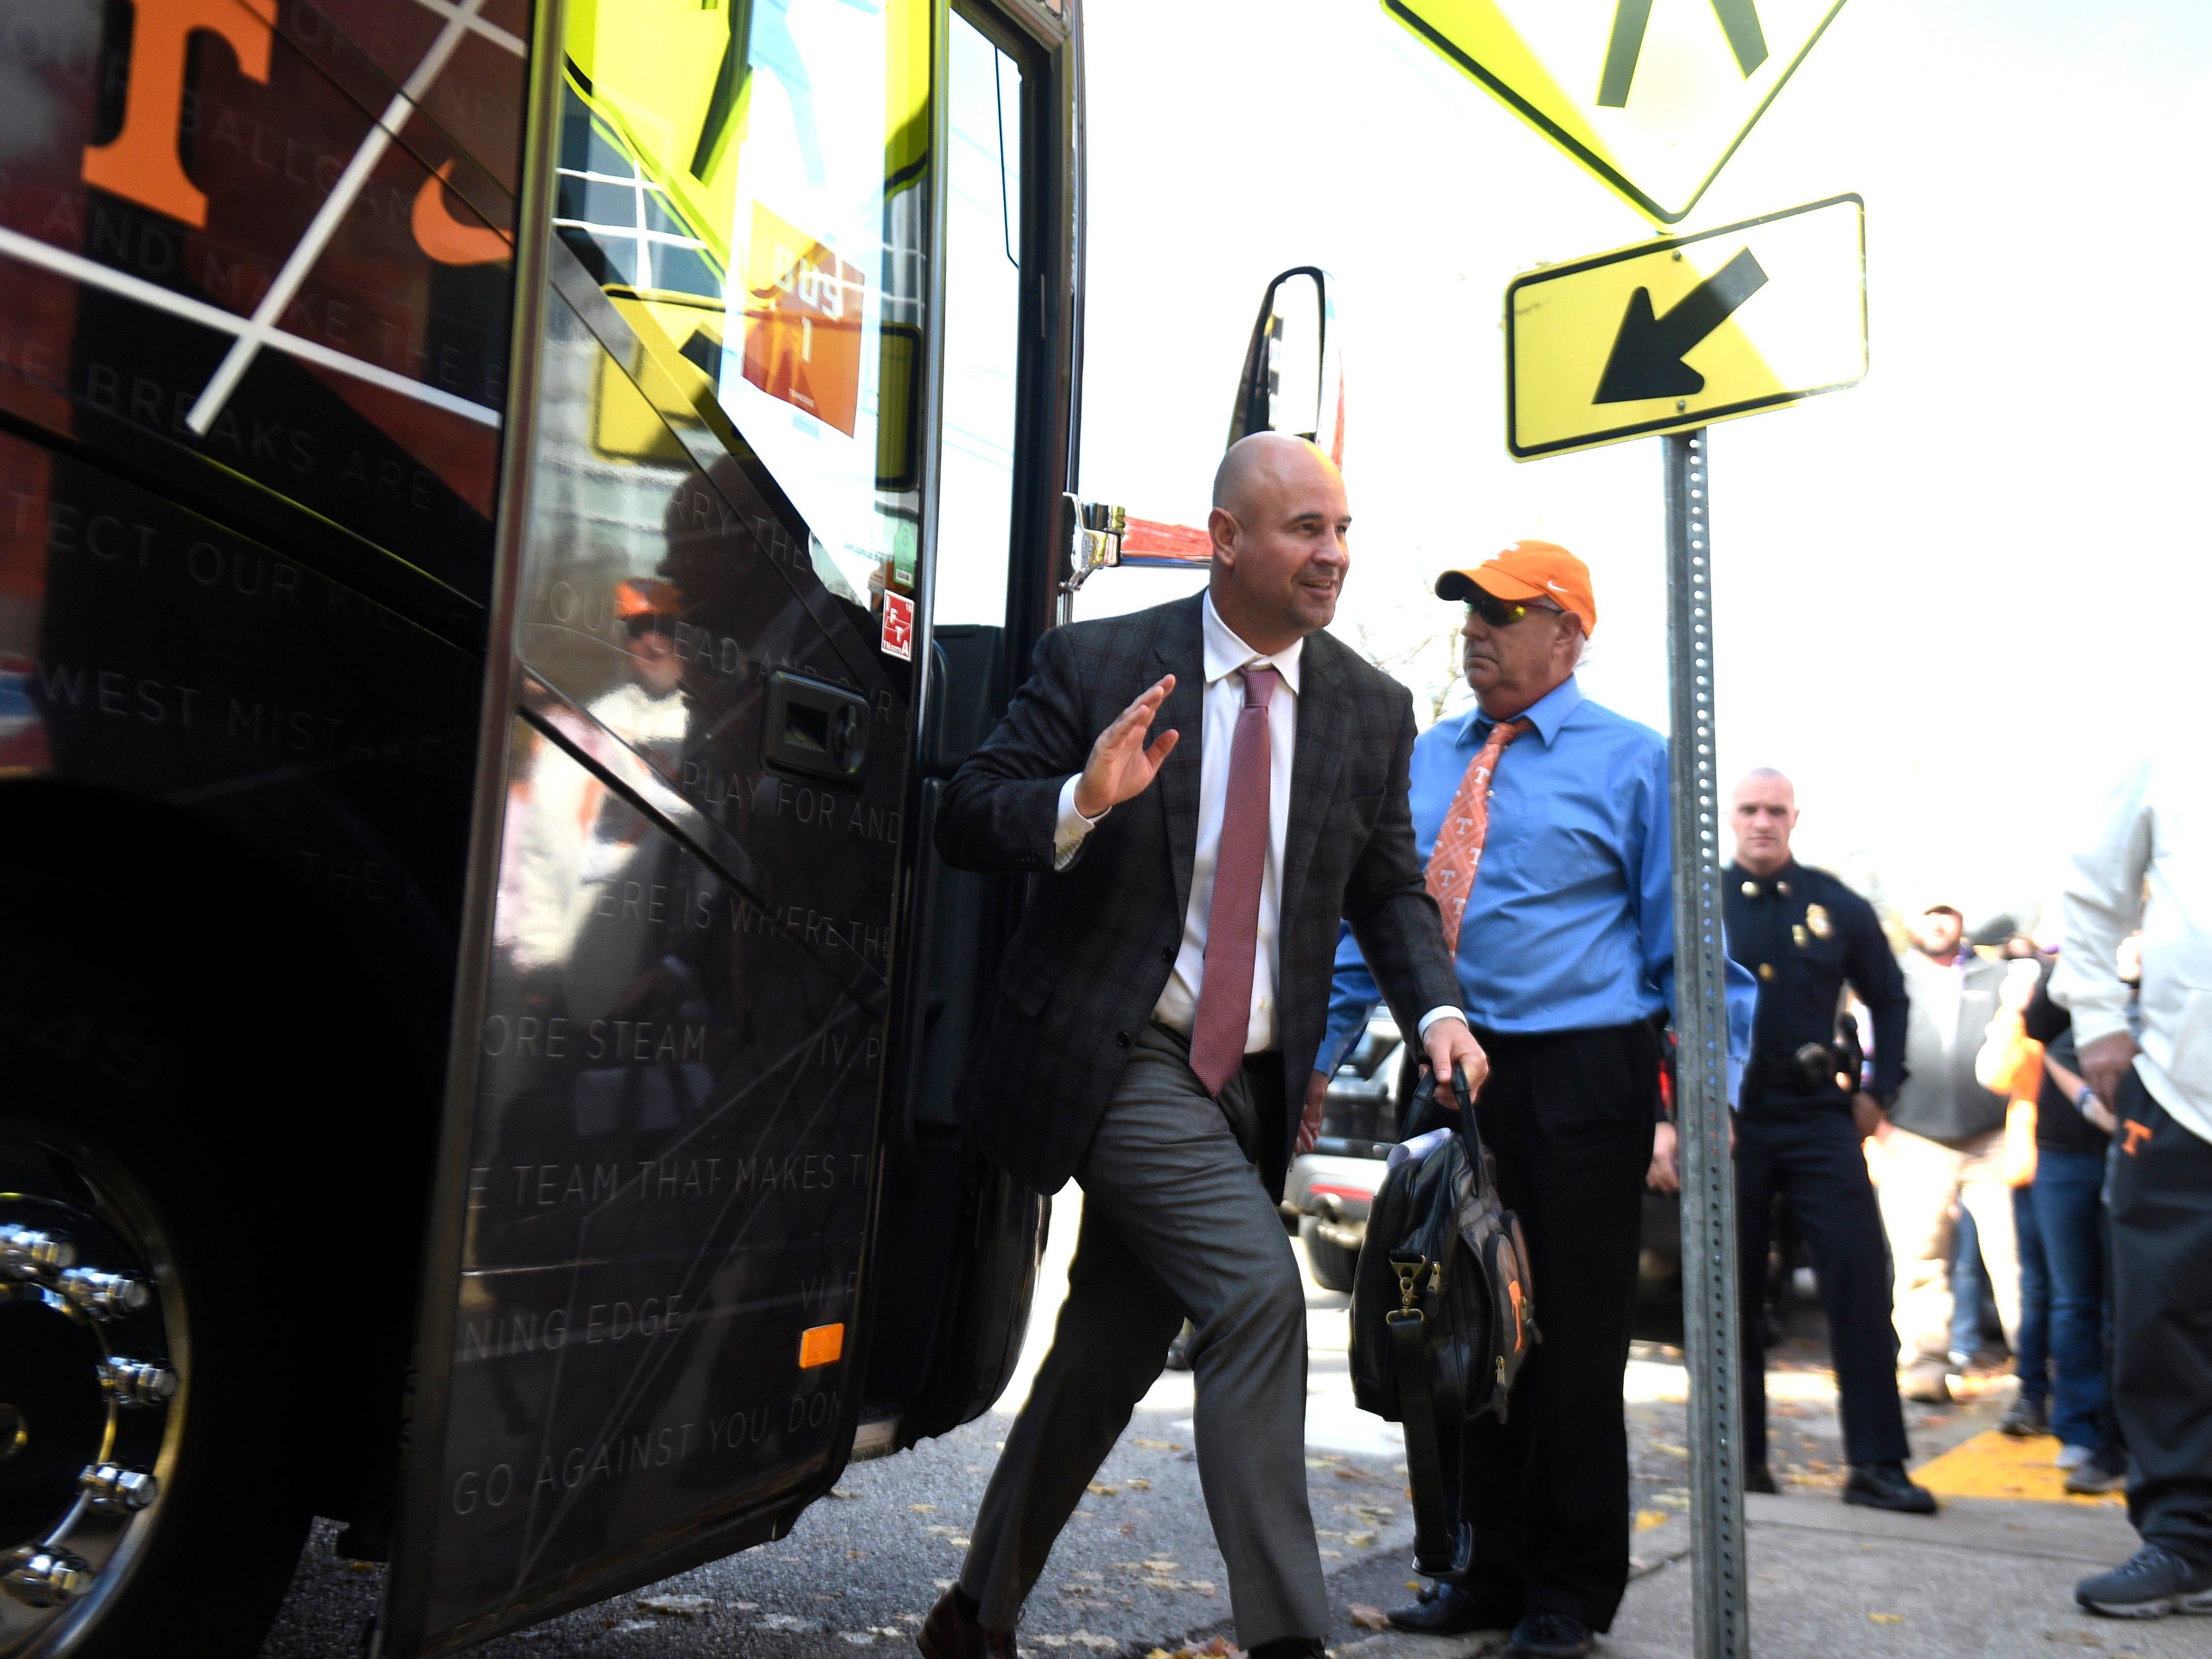 Tennessee head coach Jeremy Pruitt gets off the team bus for the game at Vanderbilt Stadium Saturday, Nov. 24, 2018, in Nashville, Tenn.